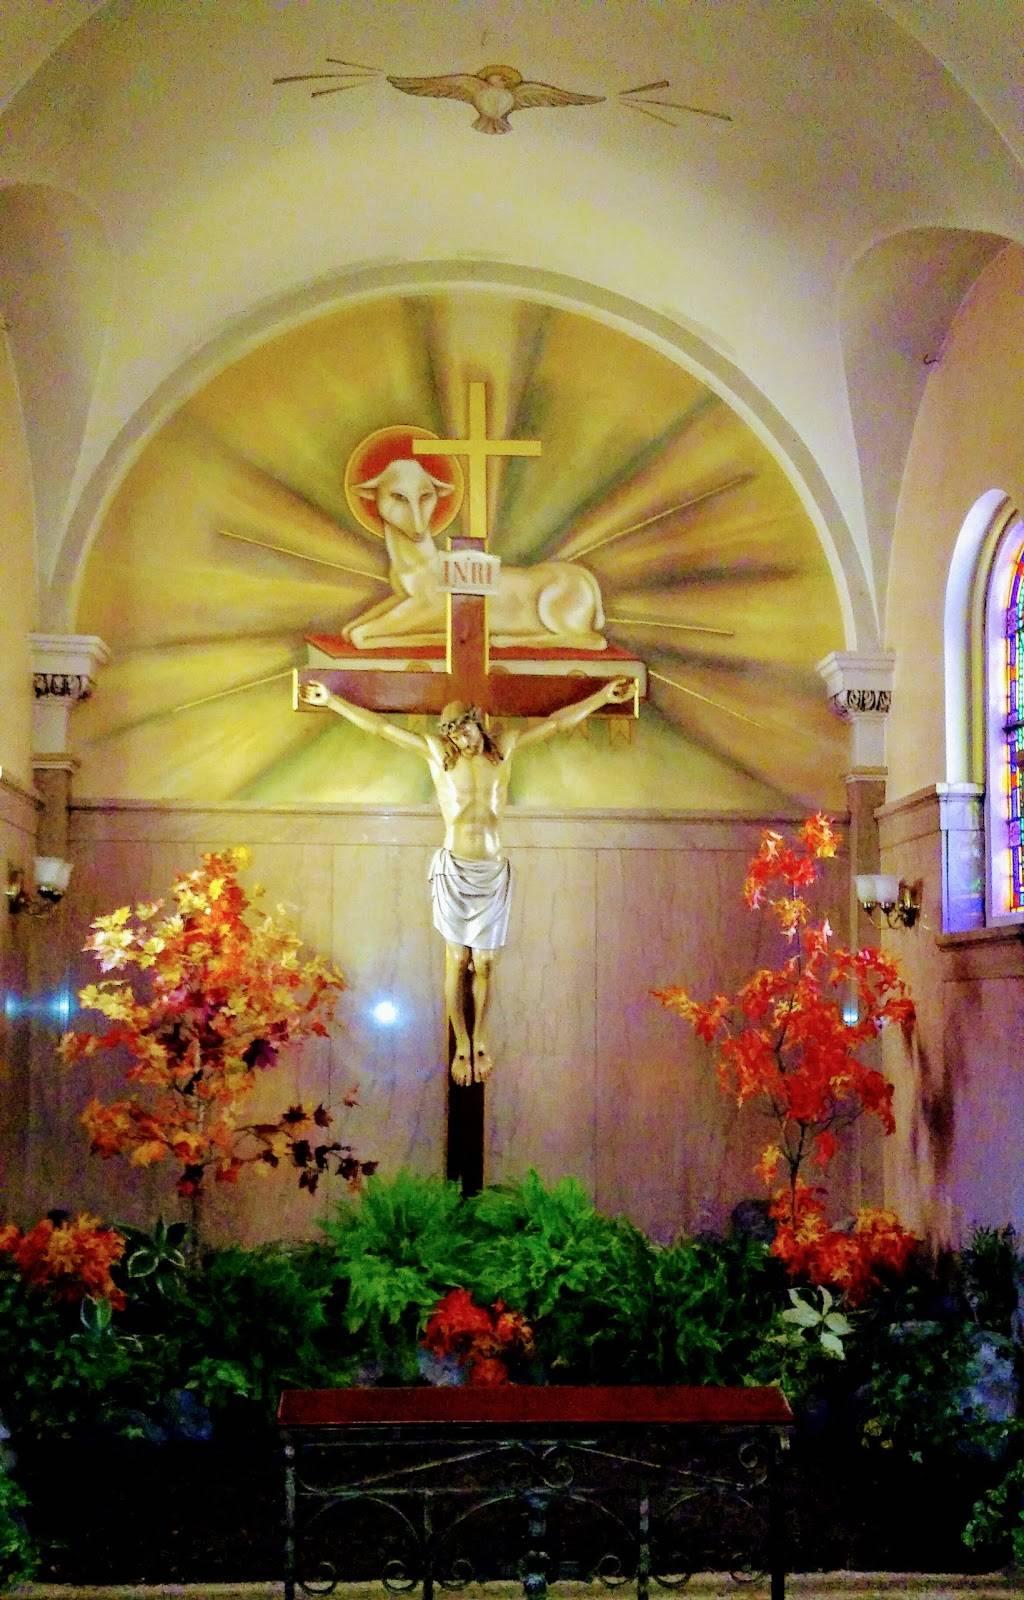 St Mary Church - church  | Photo 6 of 6 | Address: 210 Garnier St, Pittsburgh, PA 15215, USA | Phone: (412) 784-8700